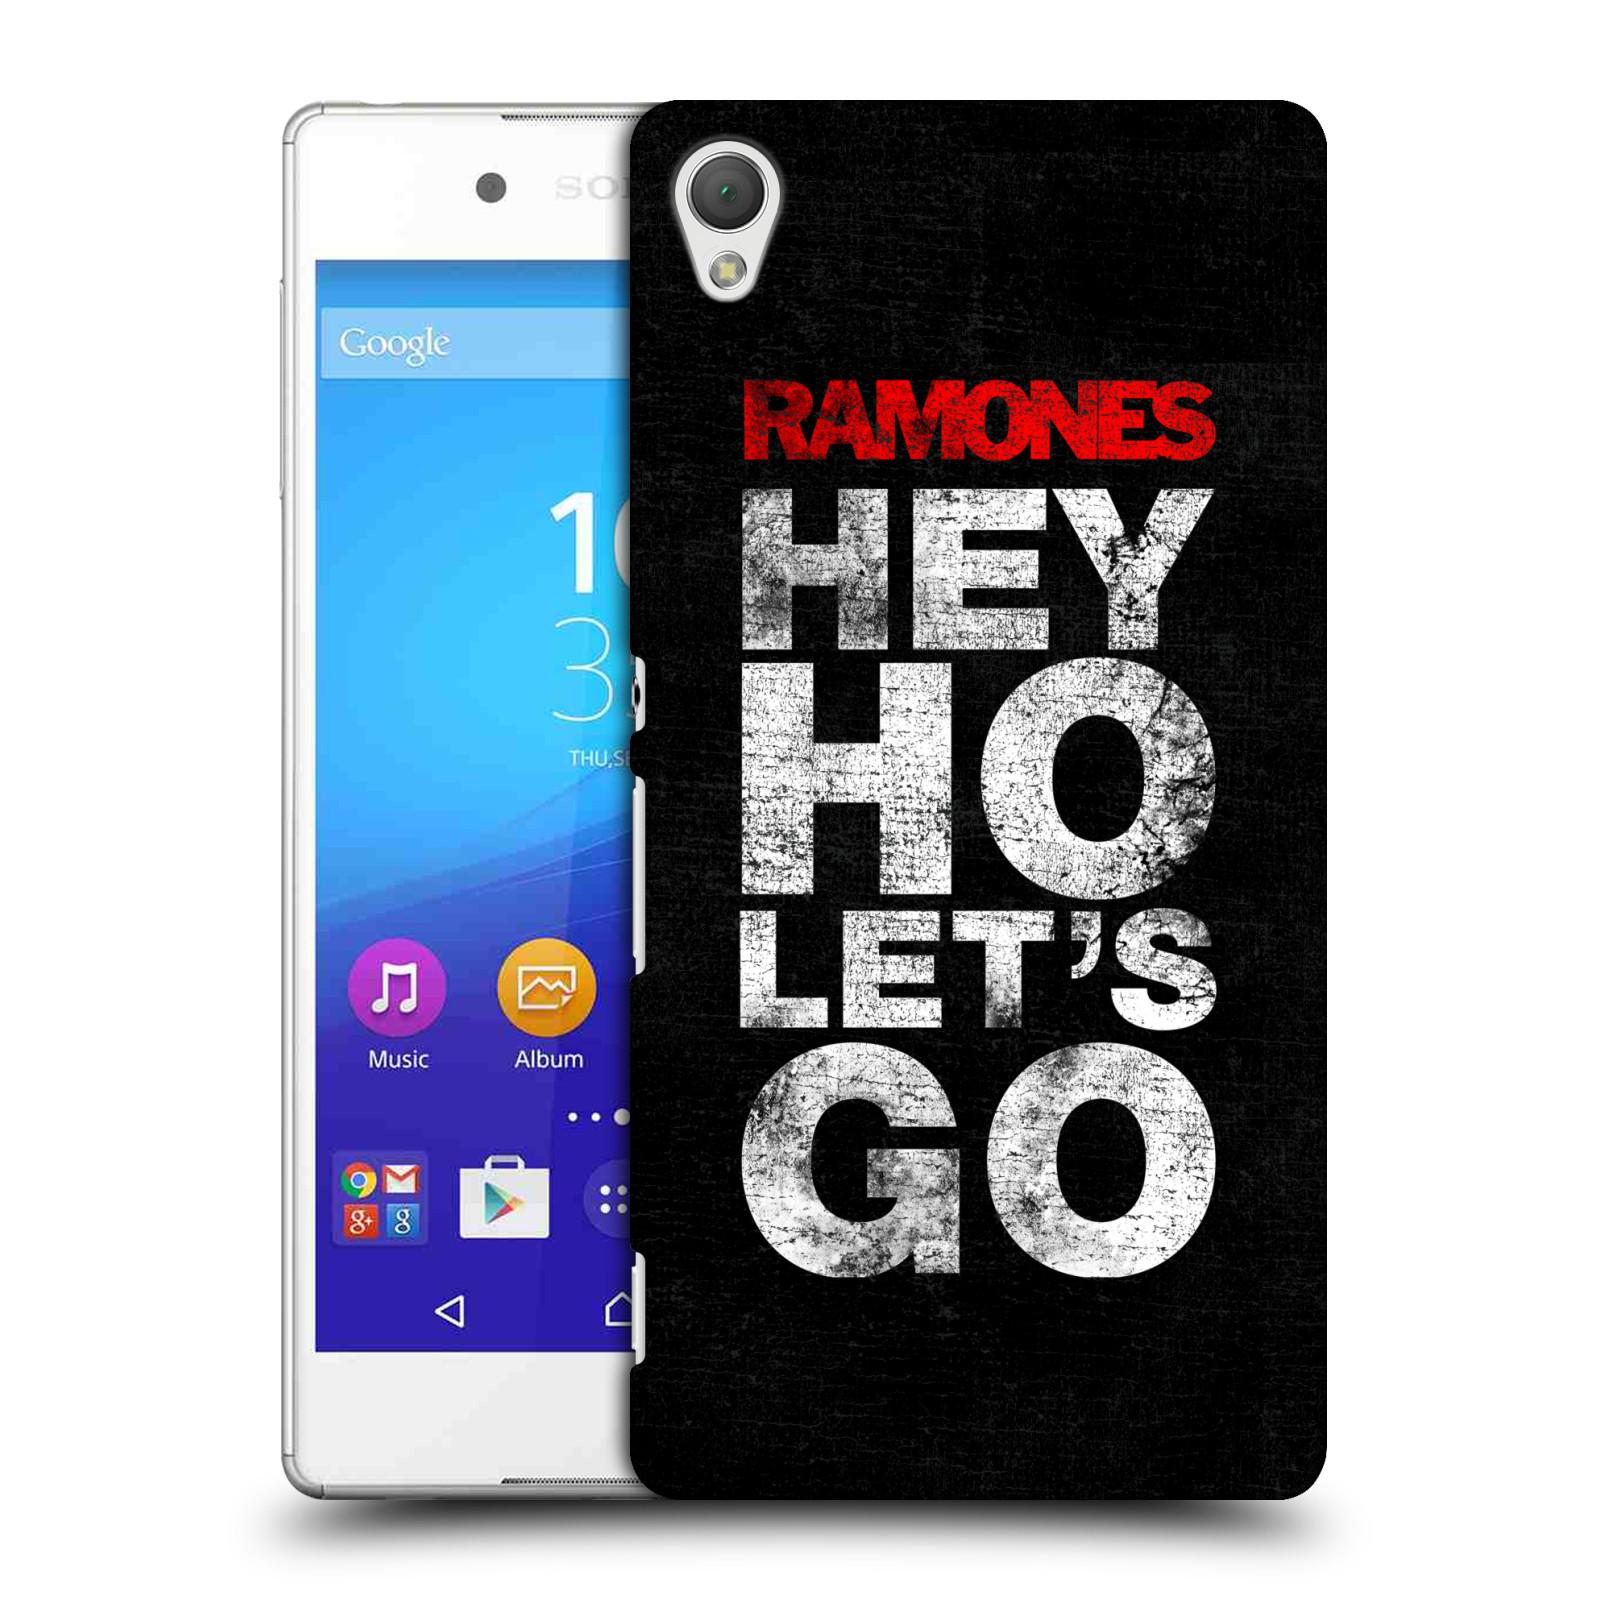 Plastové pouzdro na mobil Sony Xperia Z3+ (Plus) HEAD CASE The Ramones - HEY HO LET´S GO (Plastový kryt či obal na mobilní telefon s oficiálním licencovaným motivem The Ramones pro Sony Xperia Z3+ a Sony Xperia Z4 )